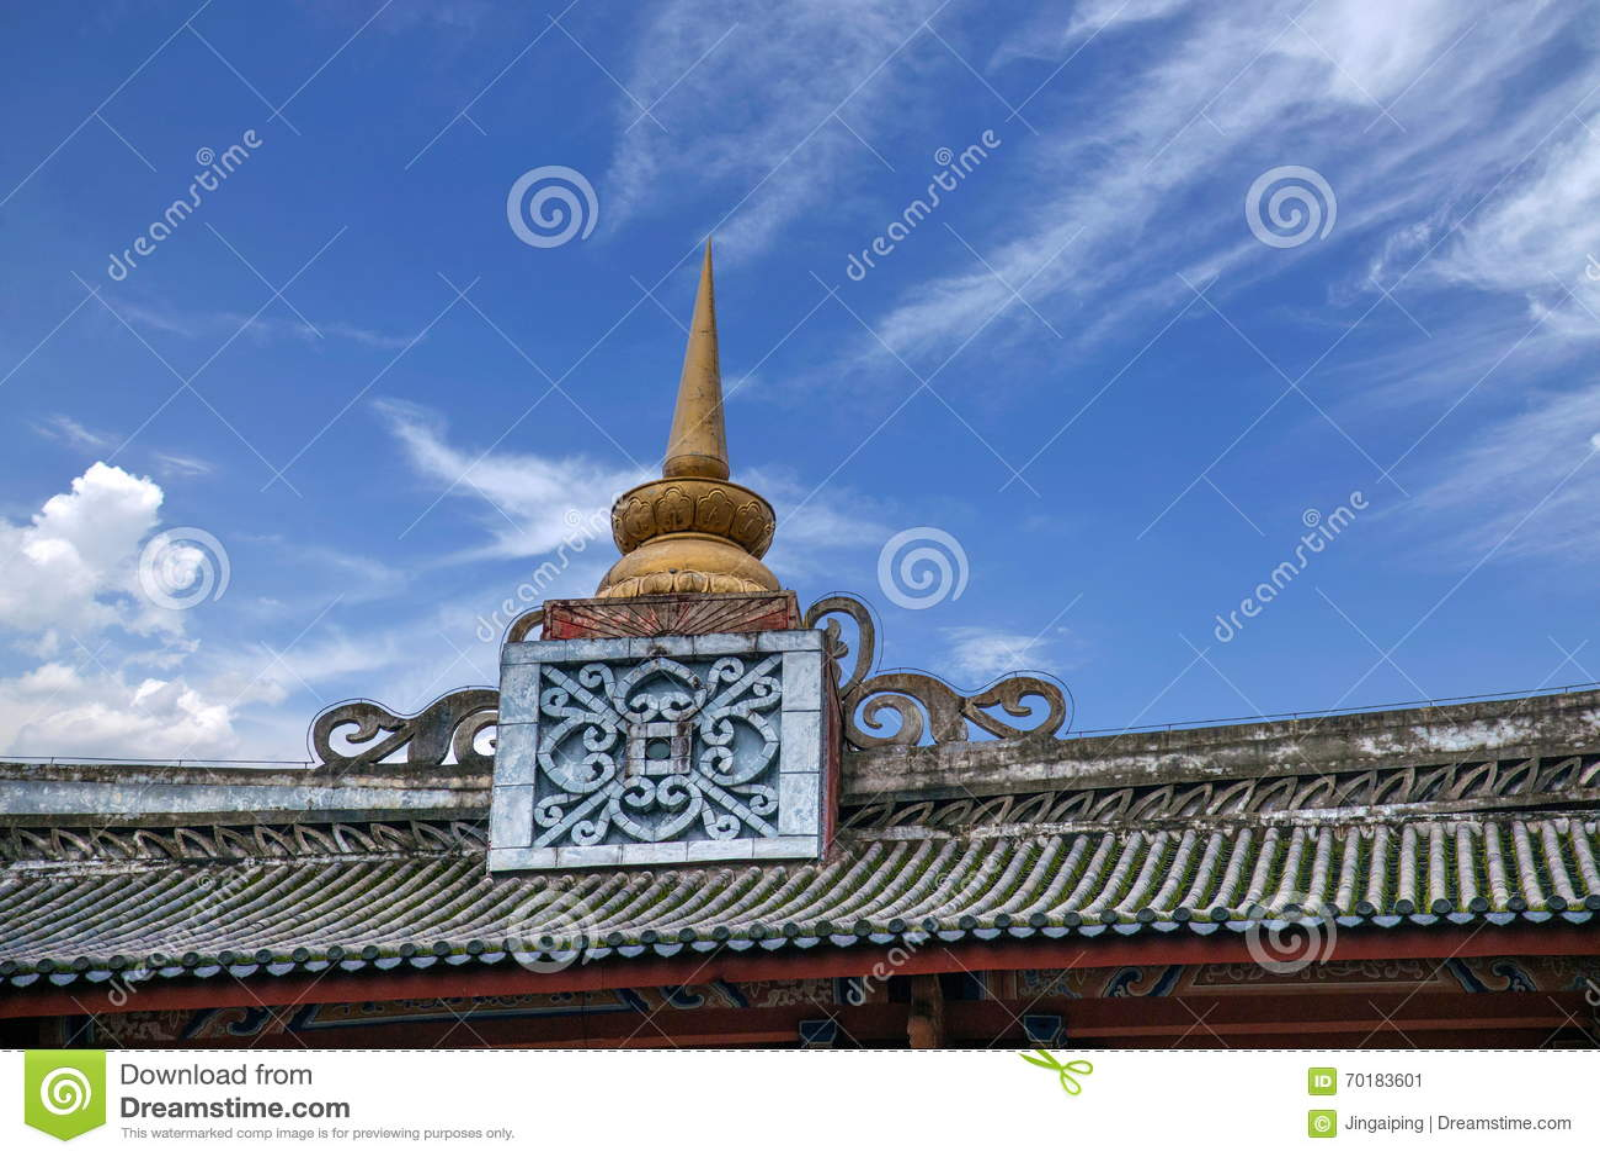 Yunnan Dali Dragon City Västra-stil byggnad